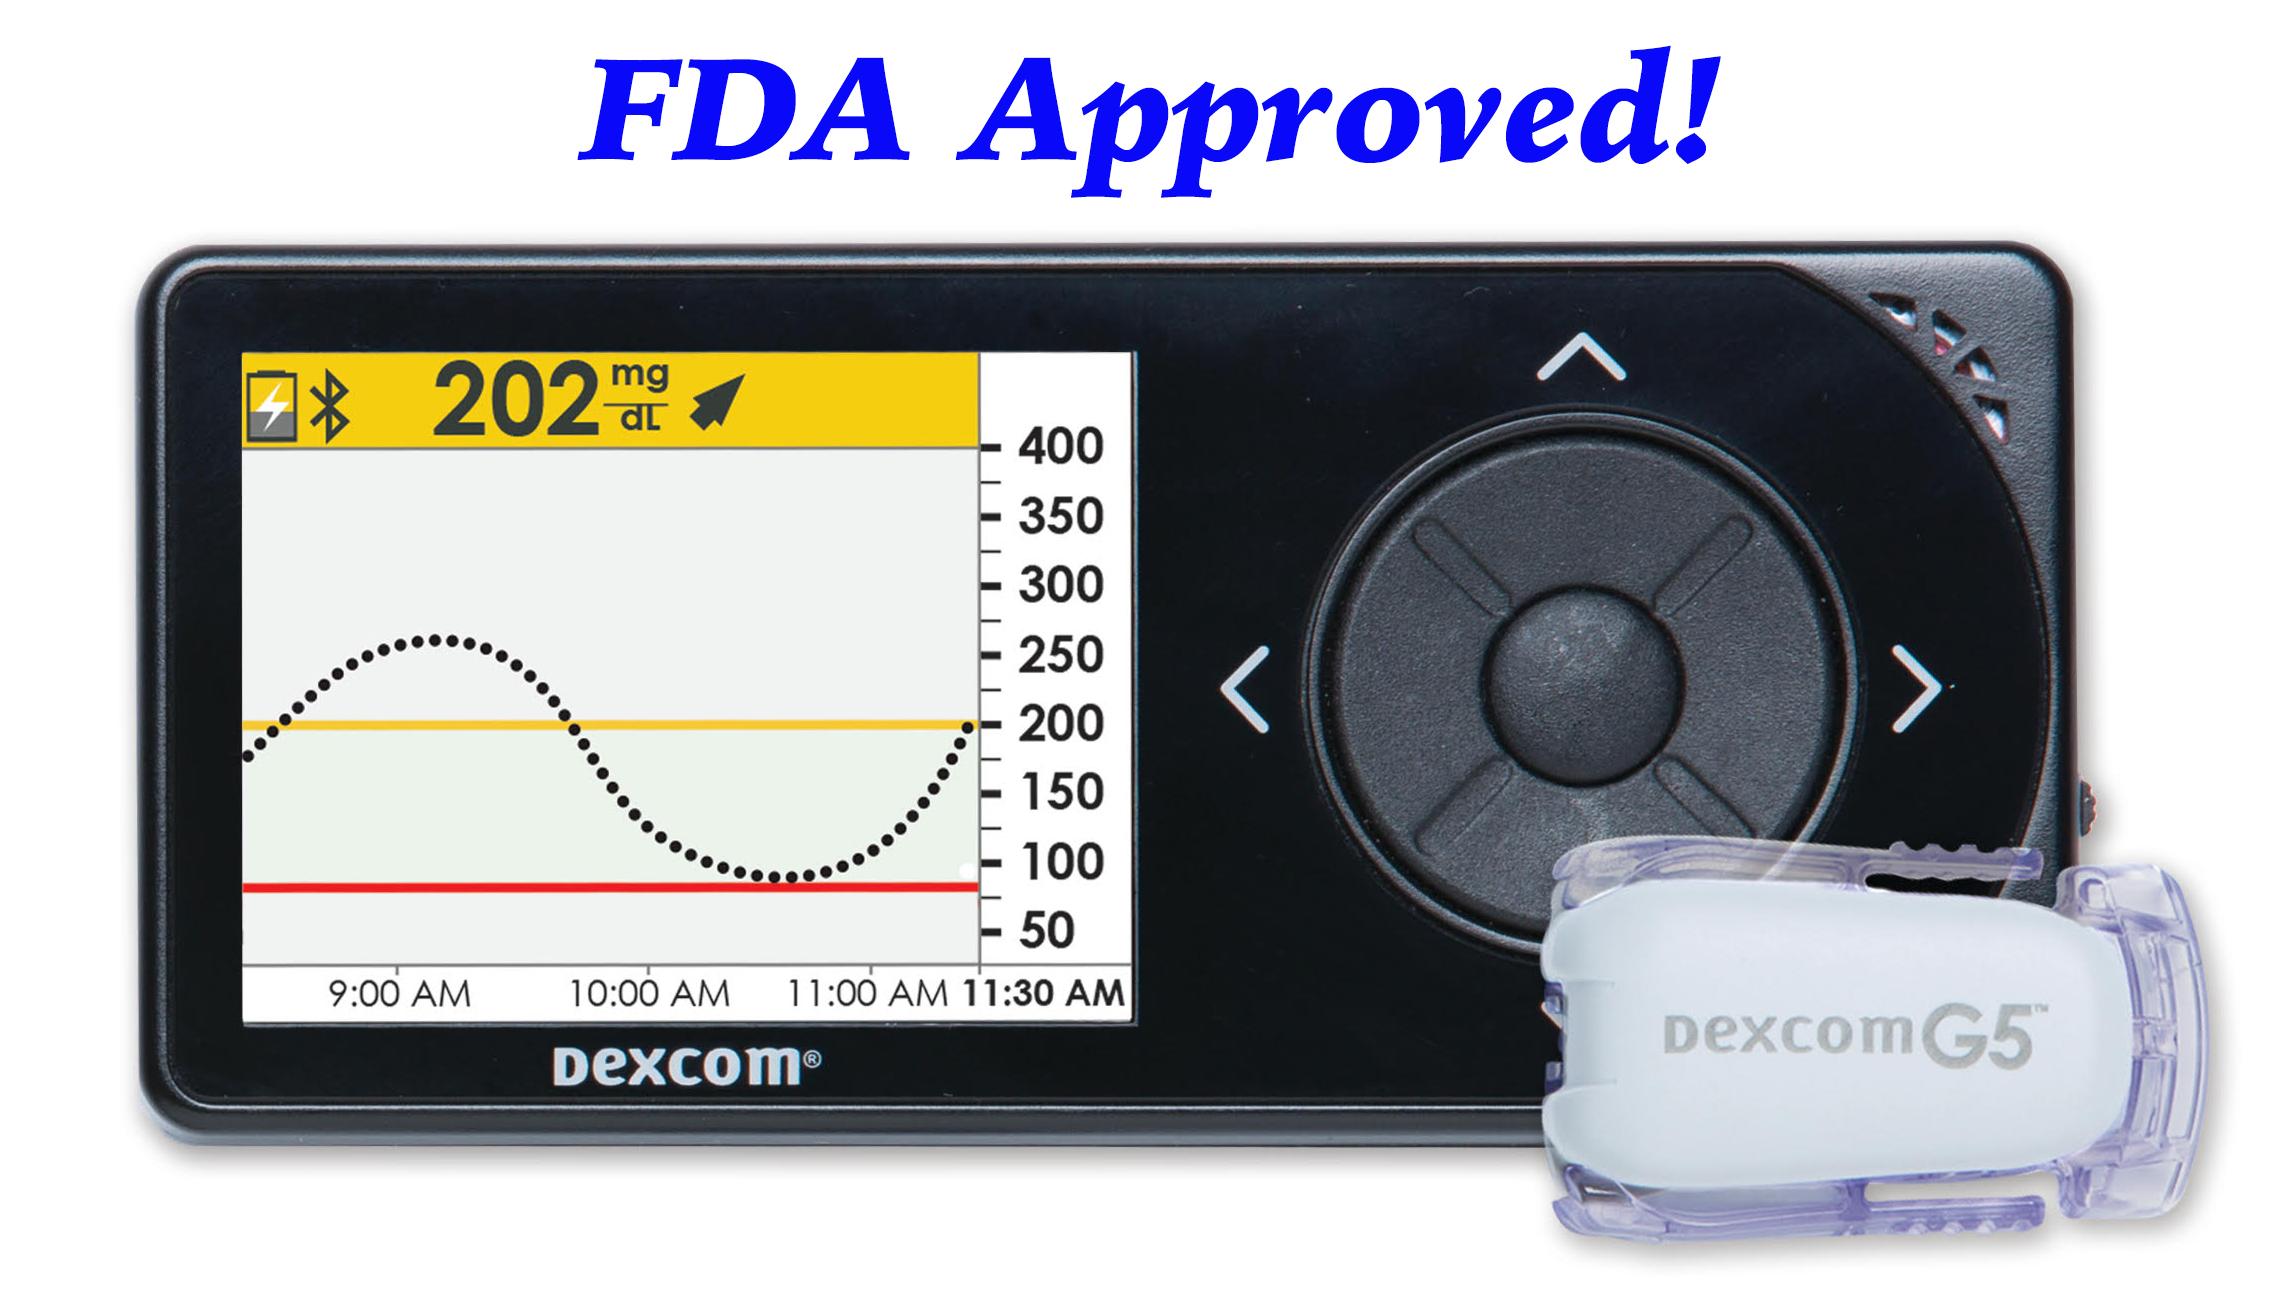 Diabetes News Fda Approves Dexcom G5 Mobile Cgm